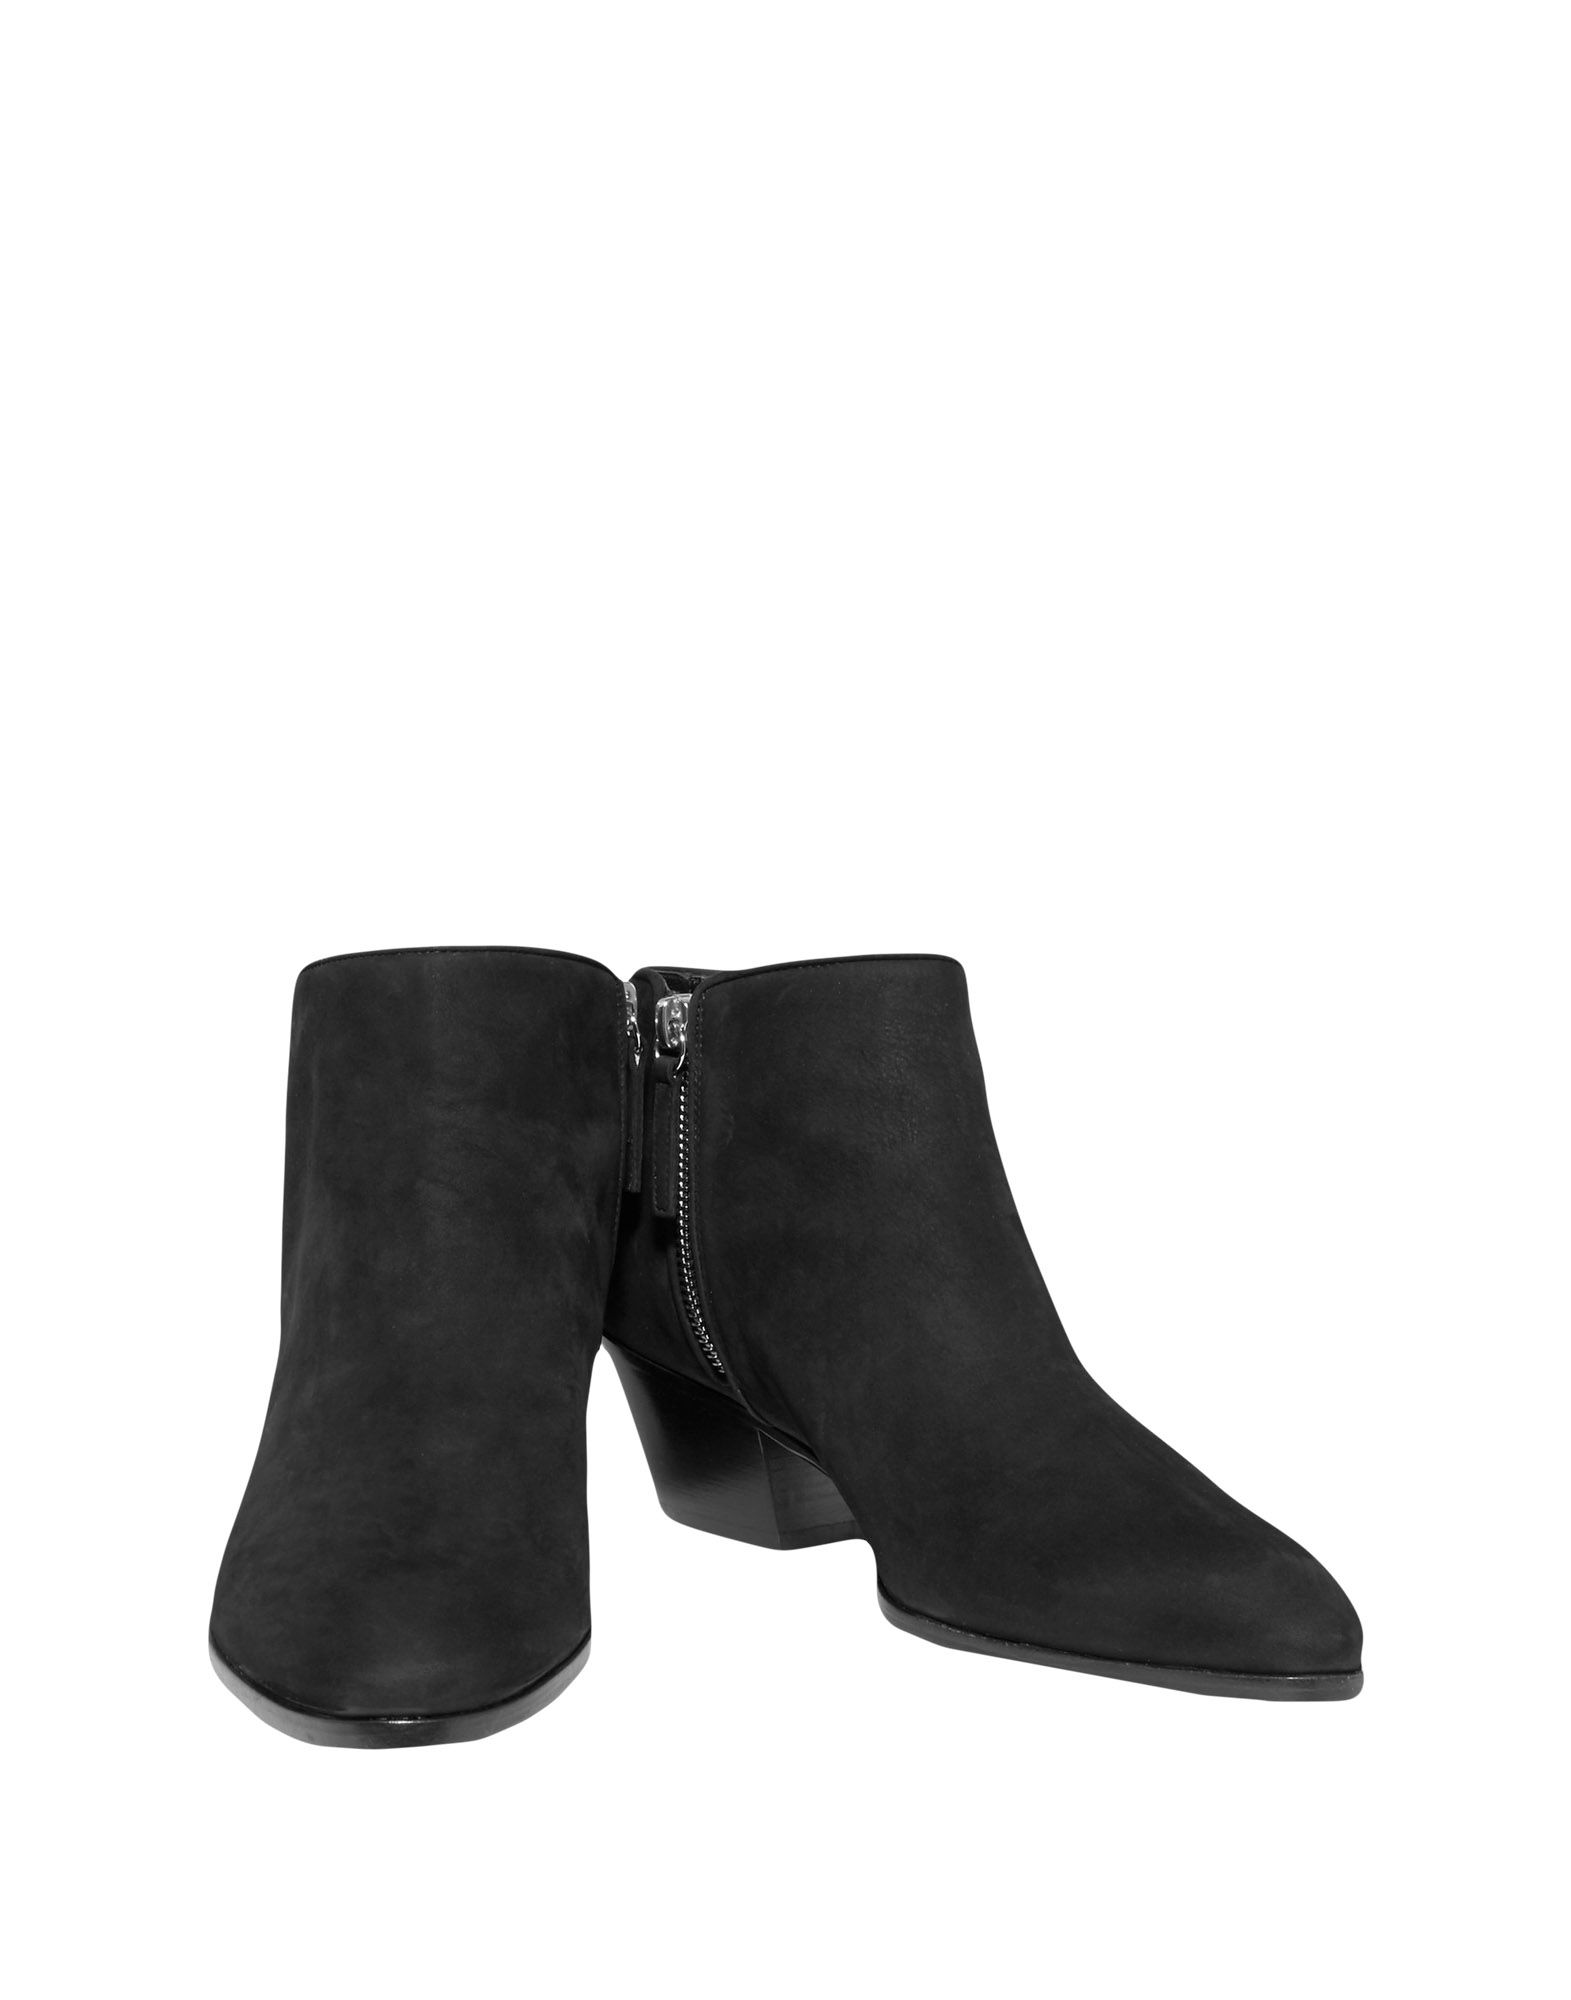 Giuseppe Zanotti Stiefelette Damen aussehende  11511165PWGünstige gut aussehende Damen Schuhe 4f5e23